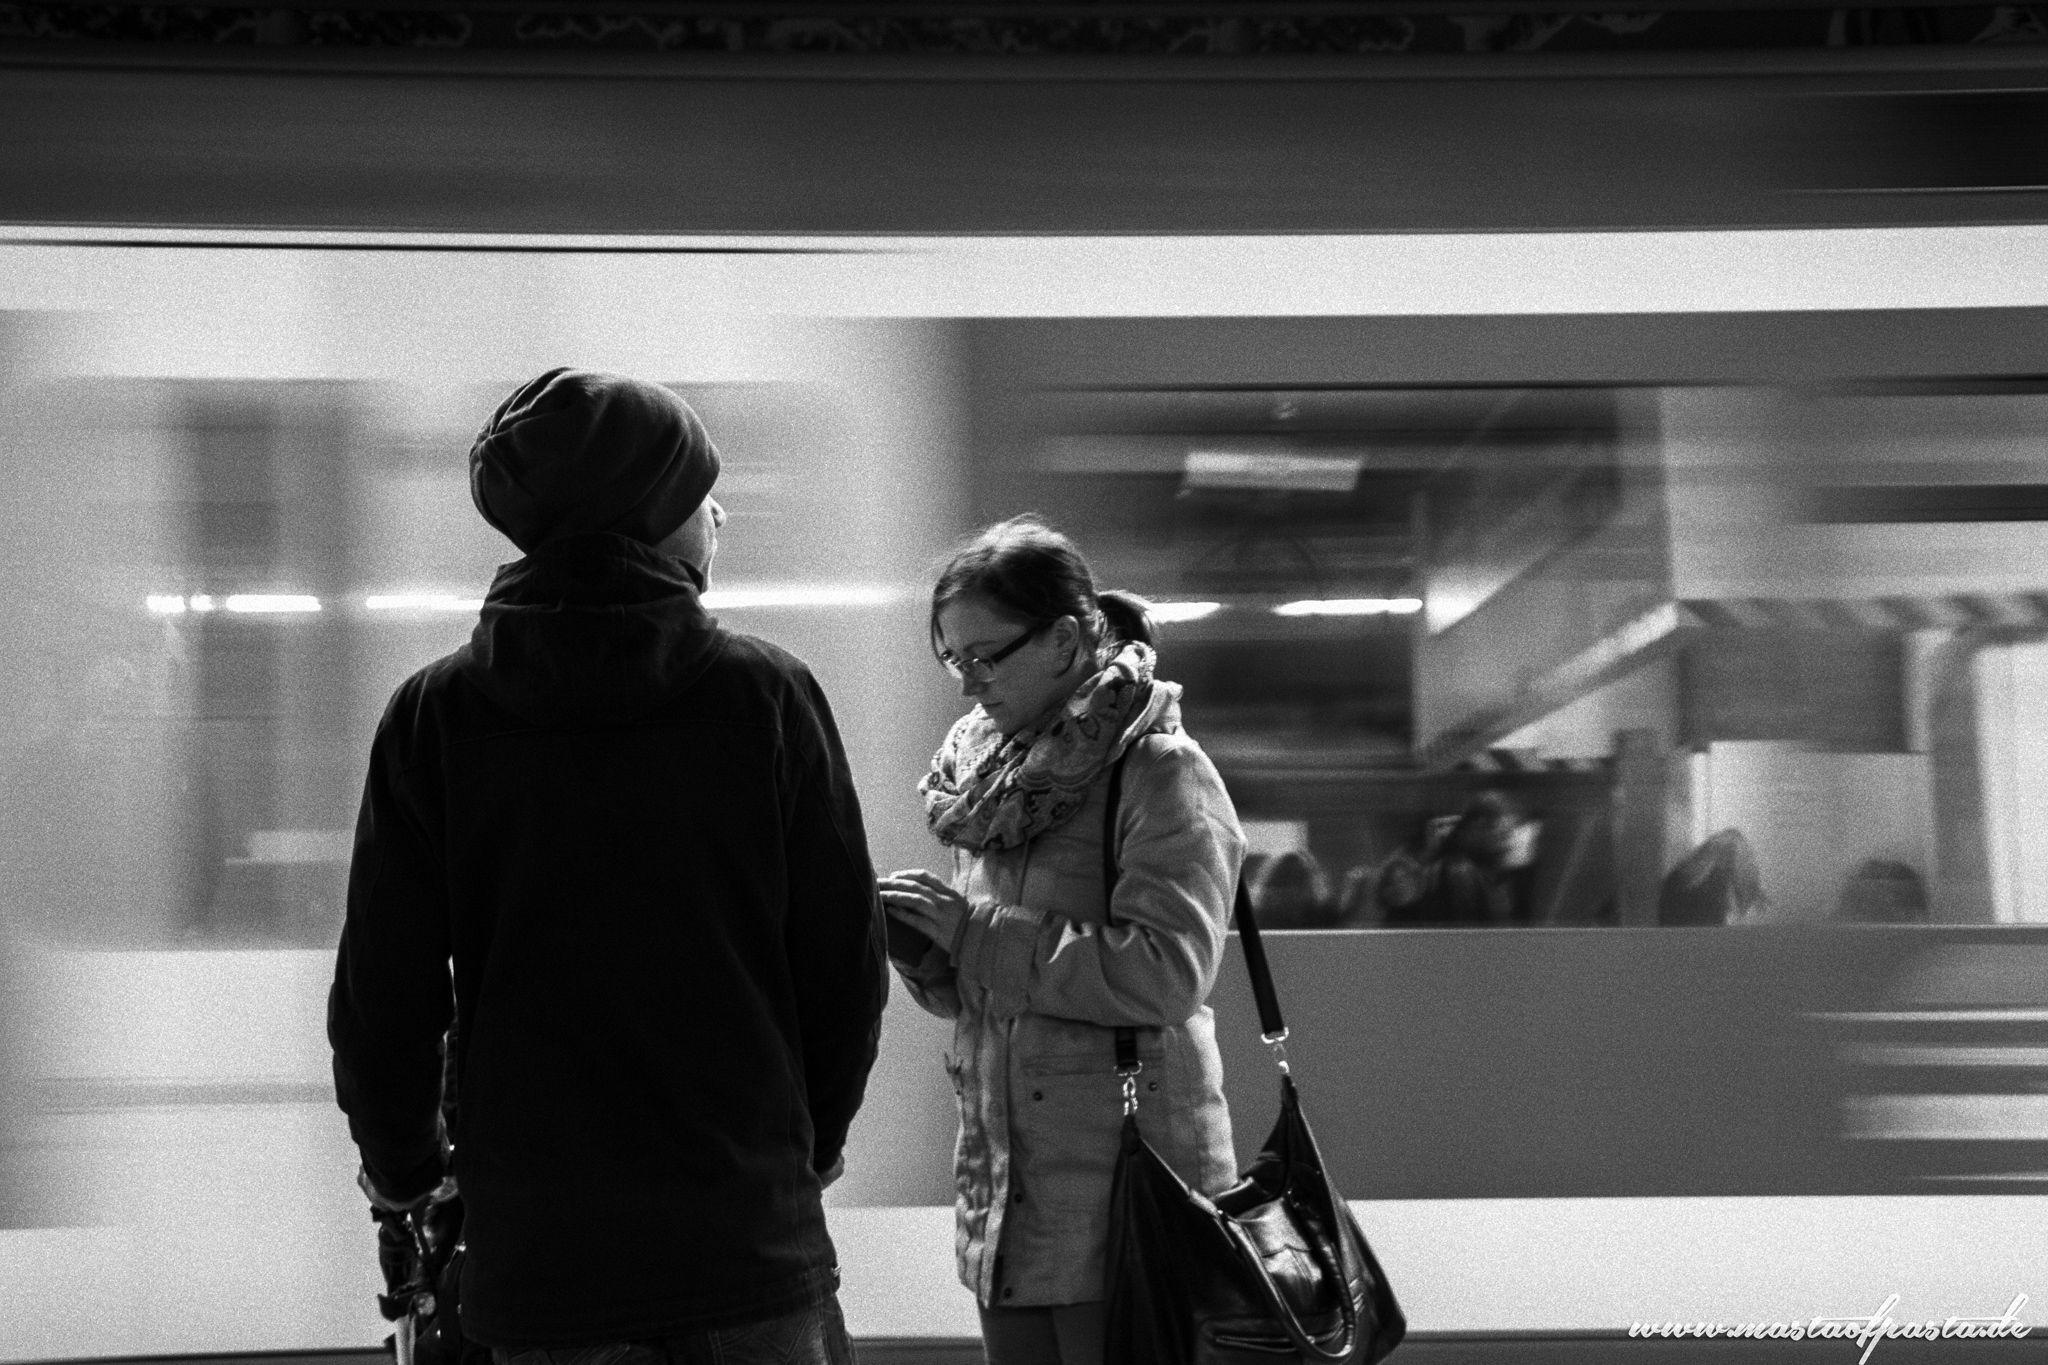 Hamburg, S-Bahnhof Jungfernstieg